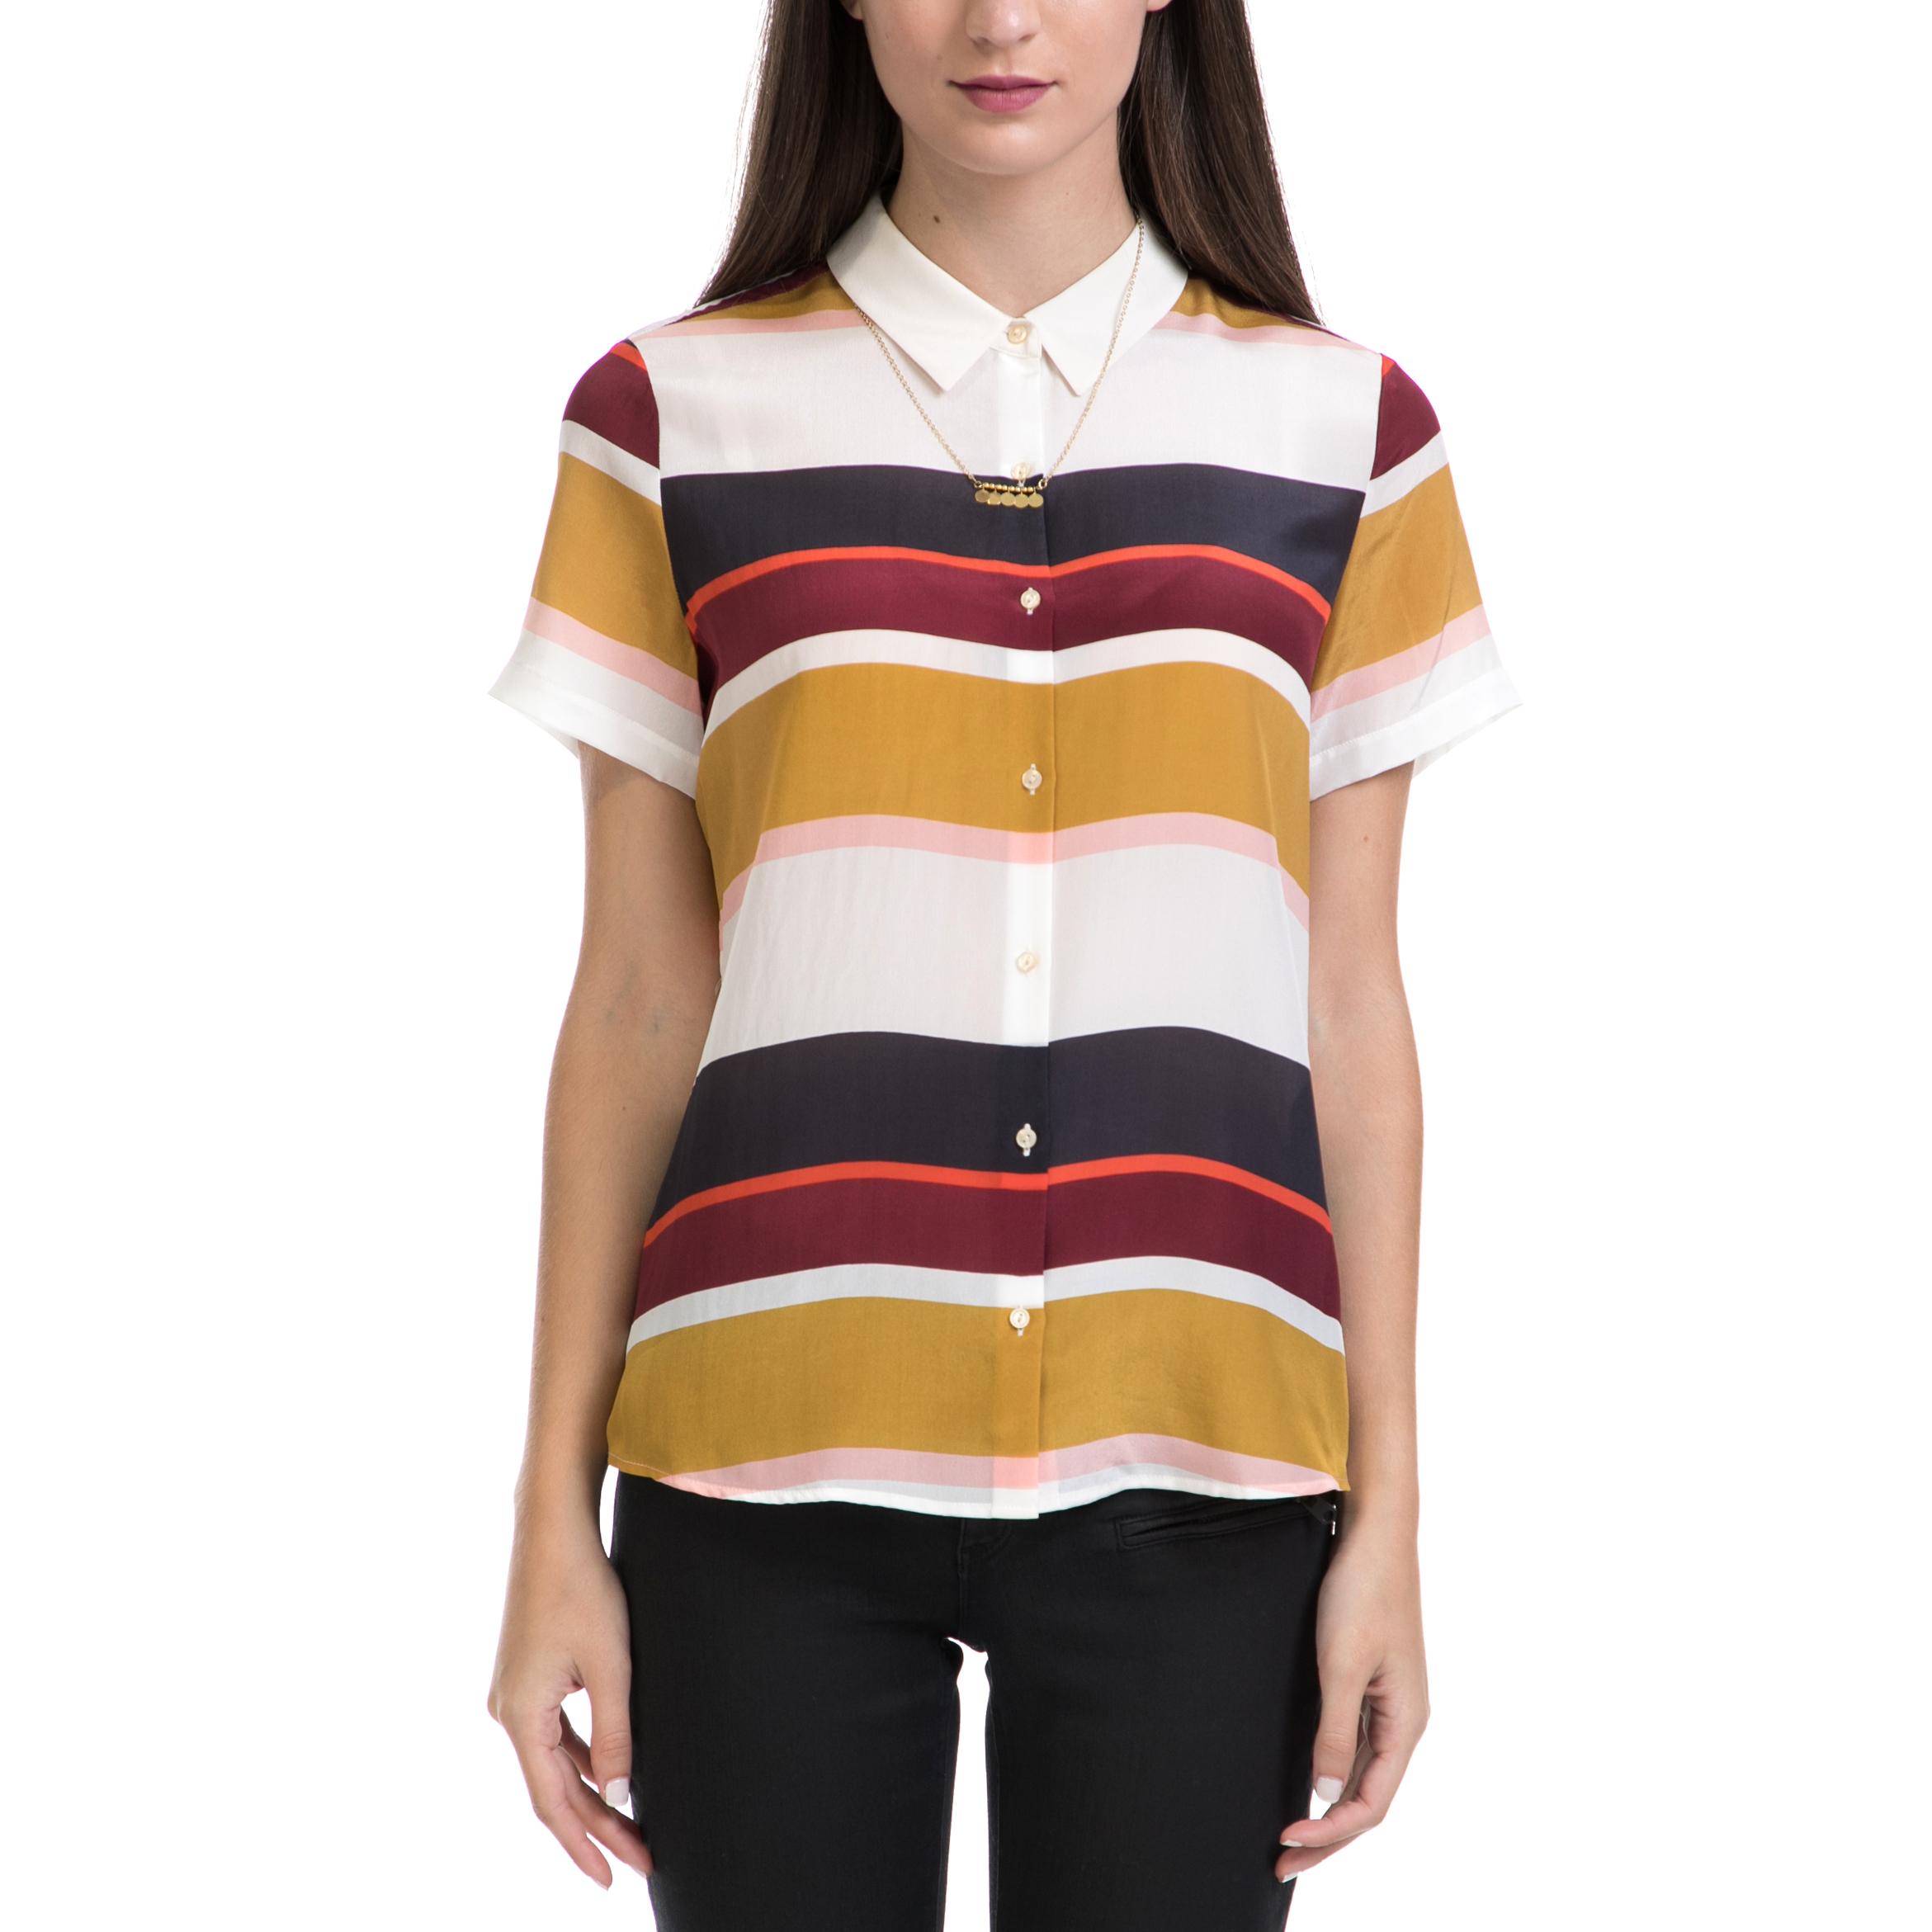 SCOTCH & SODA - Γυναικείο πουκάμισο MAISON SCOTCH ριγέ γυναικεία ρούχα πουκάμισα κοντομάνικα αμάνικα